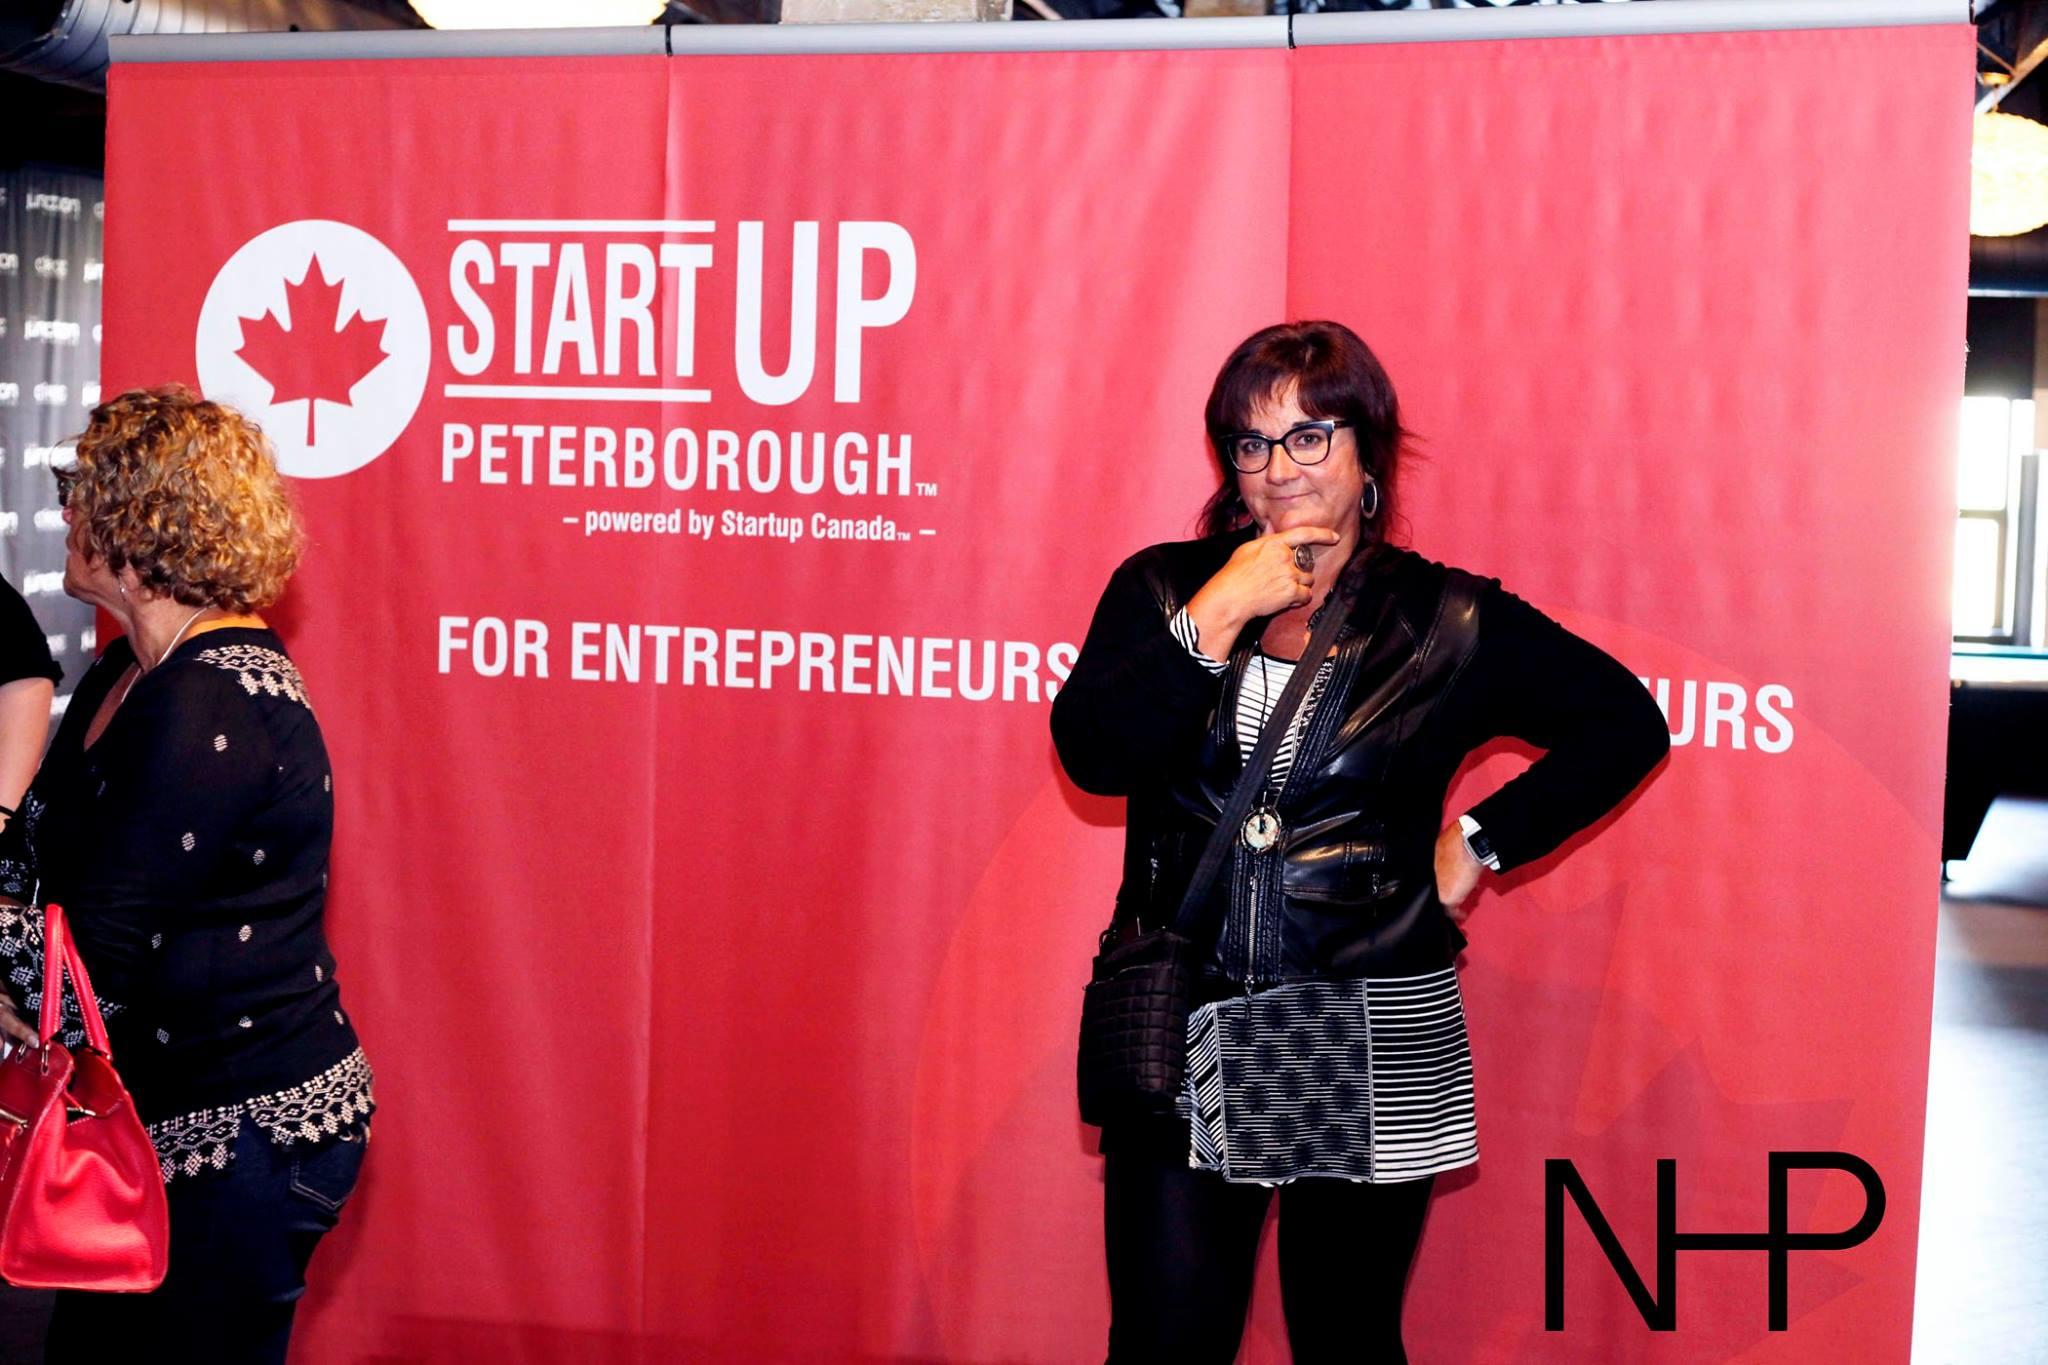 Sofie's a StartUpPtbo Founder